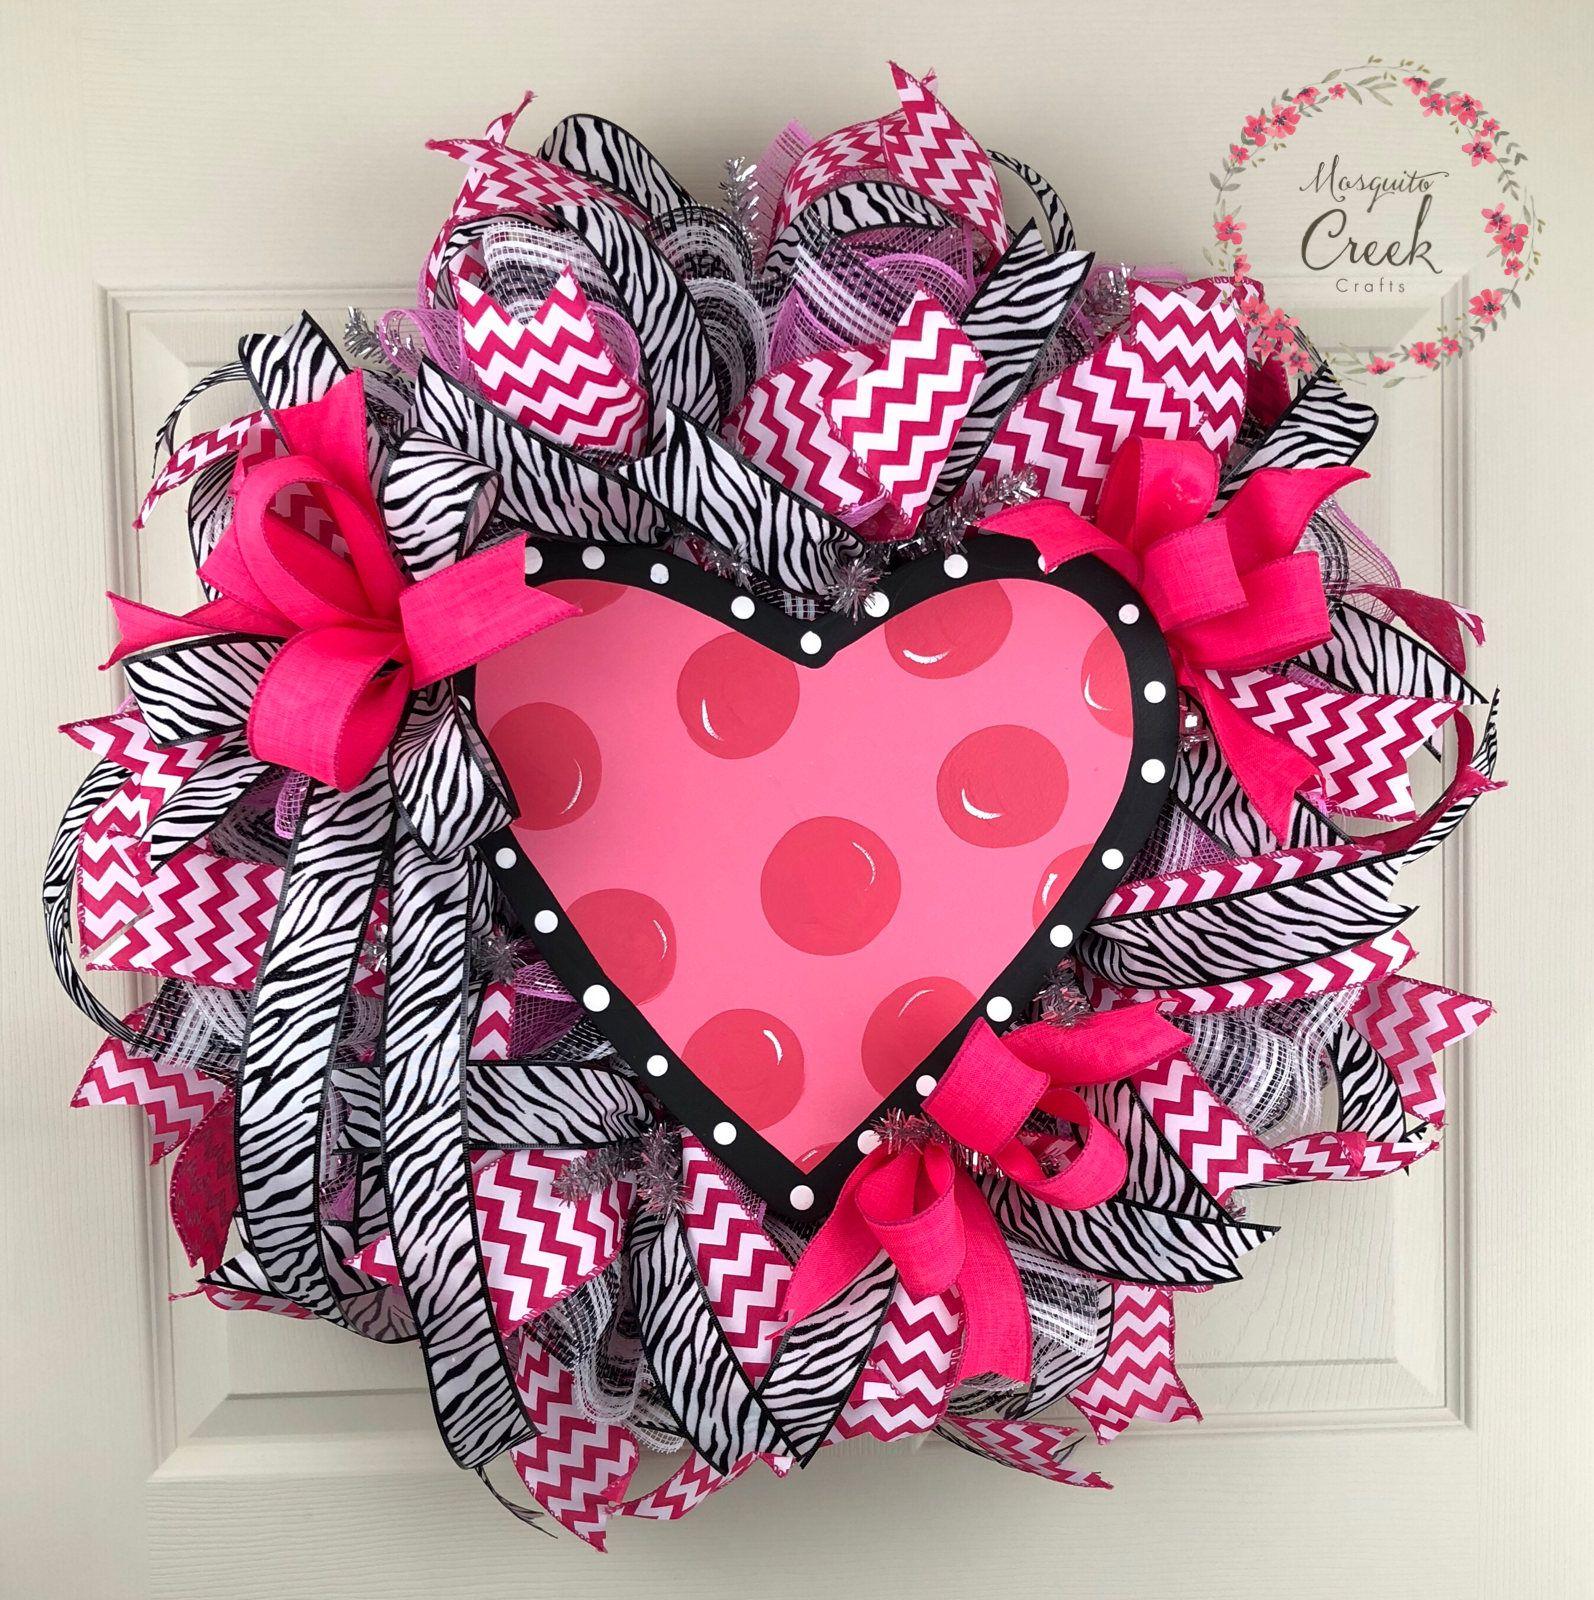 Valentines wreath for front door heart wreath valentines day valentines wreath for front door heart wreath valentines day wreath deco mesh valentines wreath pink outdoor wreath porch decor a beautiful valentine rubansaba